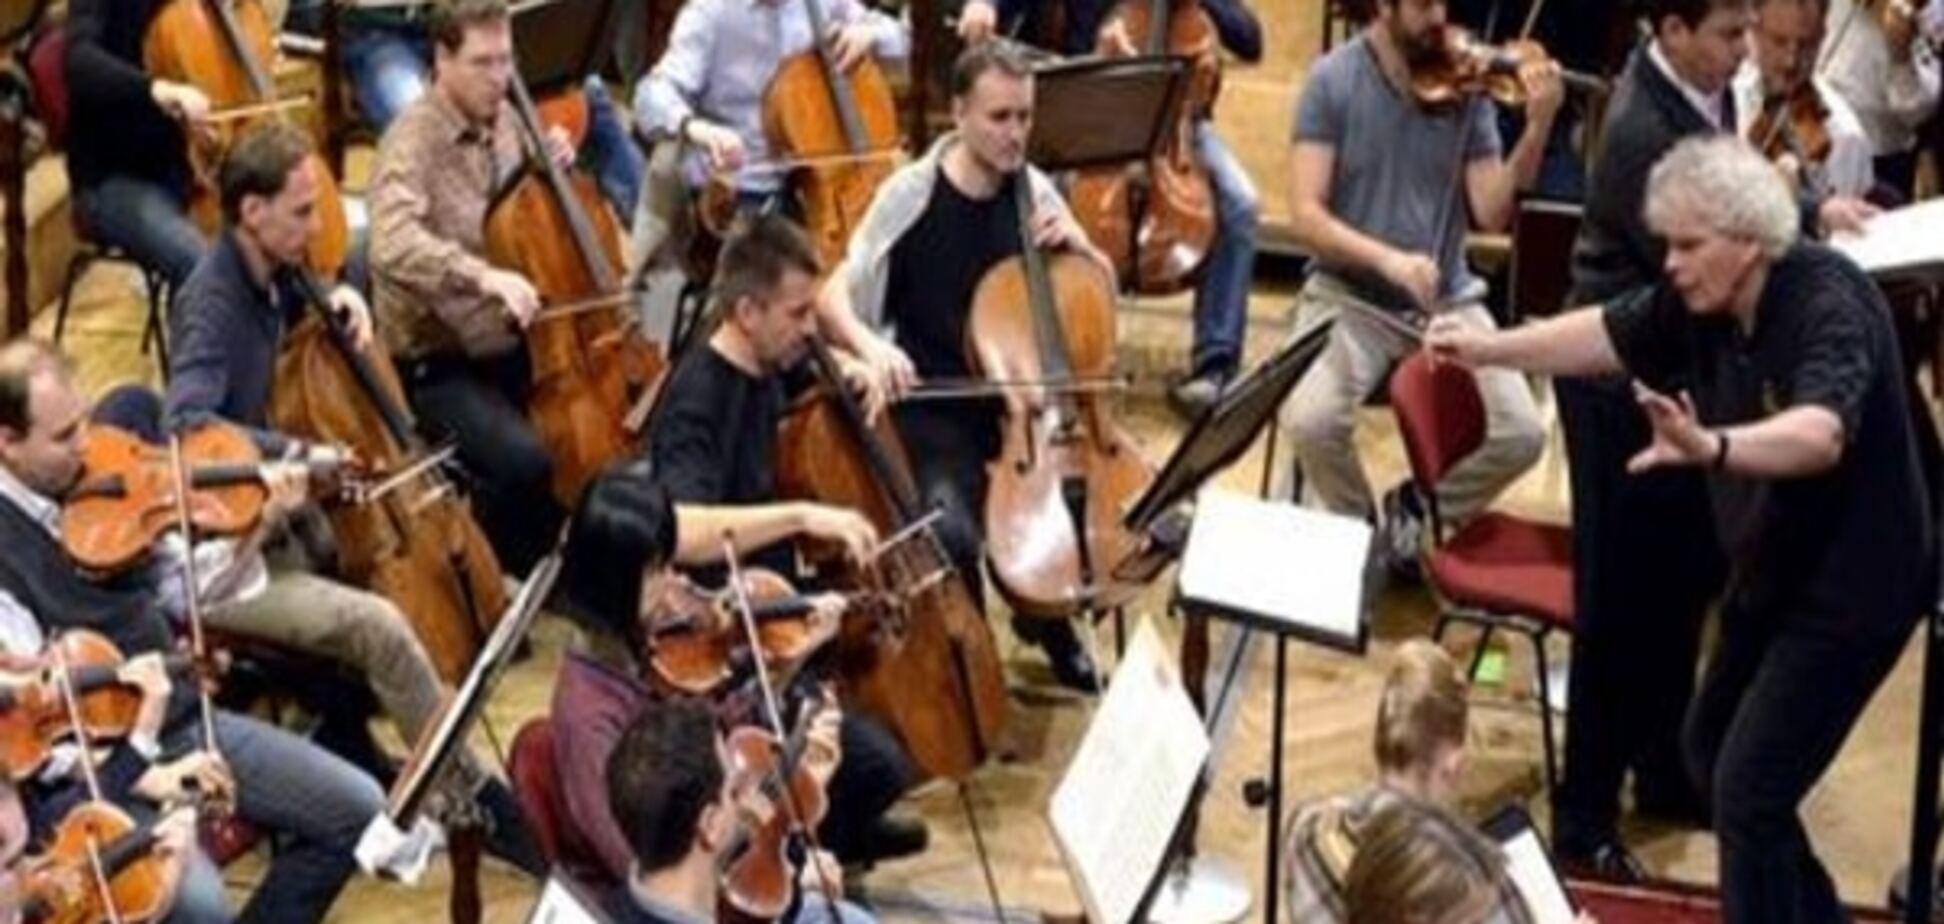 Віртуальні екскурсії: За лаштунками Берлінської філармонії